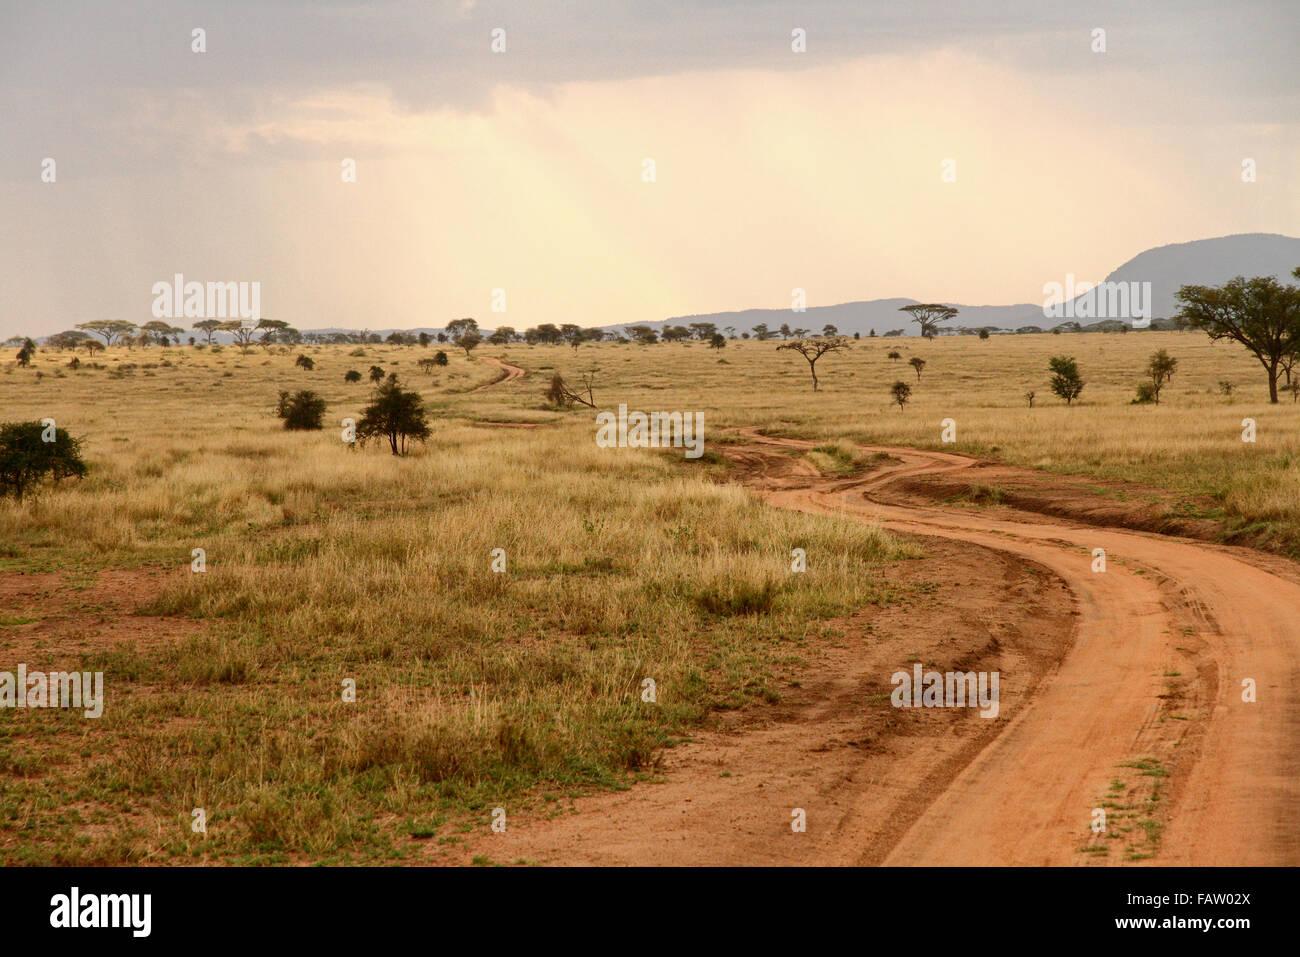 Un camino de tierra serpentea a través de la sabana africana Imagen De Stock